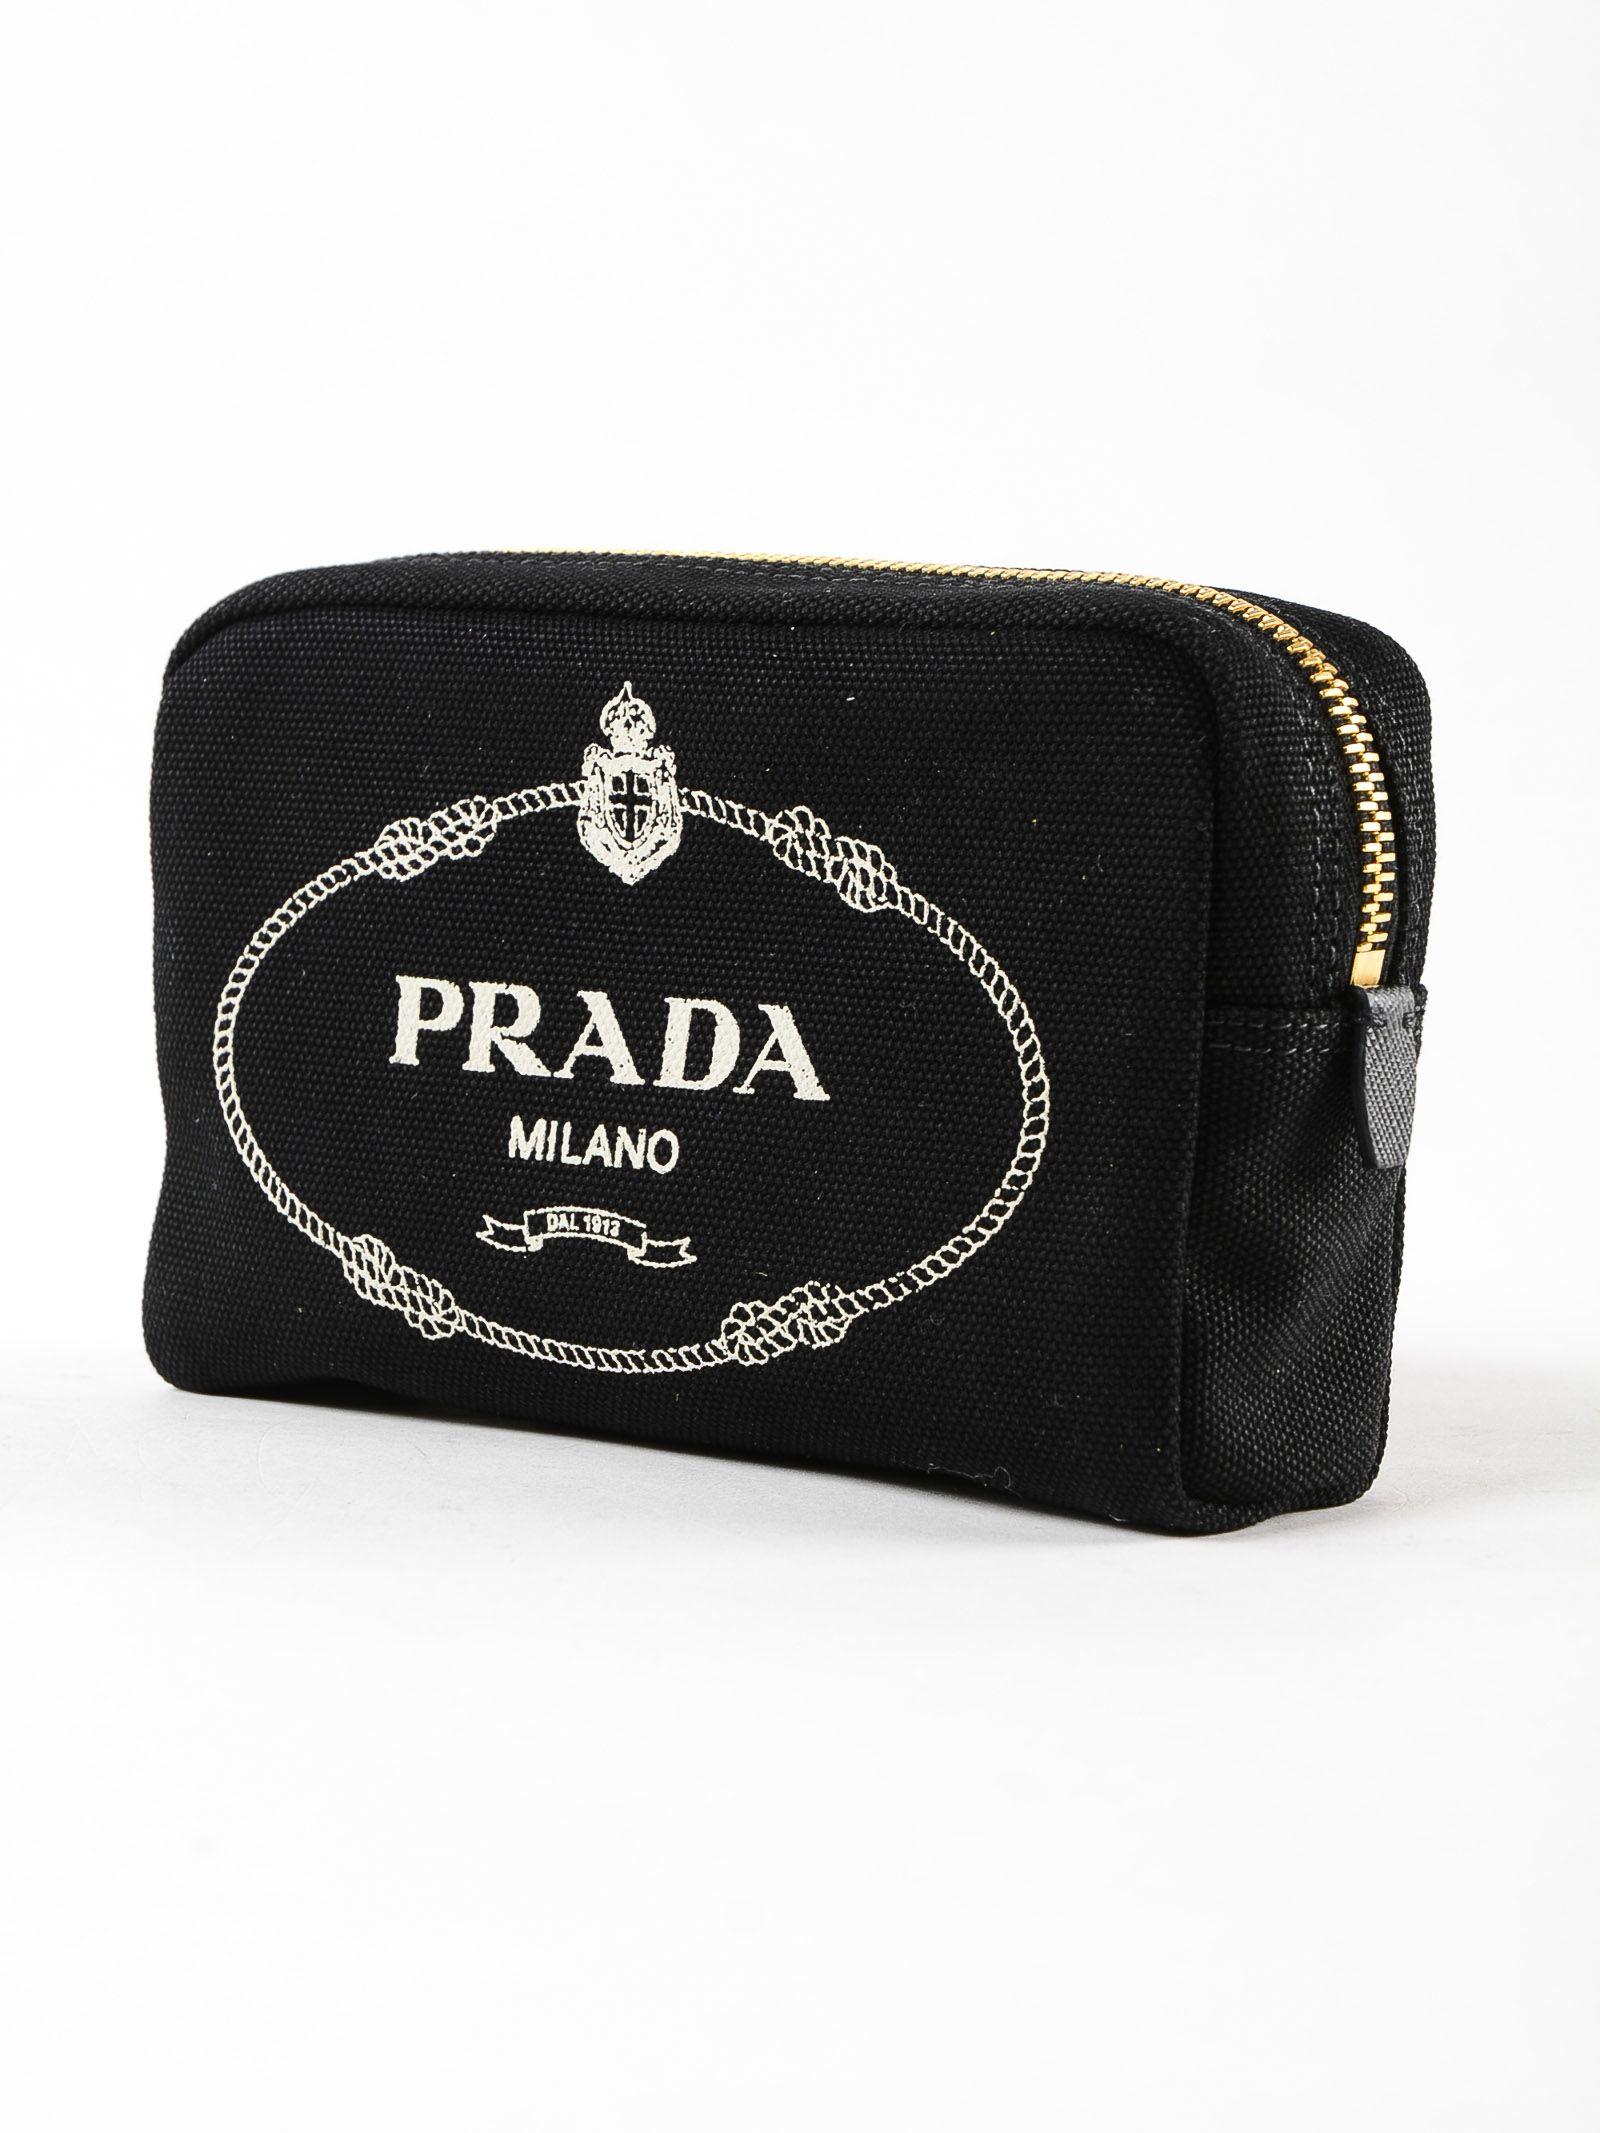 3af81cab4171 Prada Prada Canapa Logo Clutch - Nero+talco - 10779691   italist